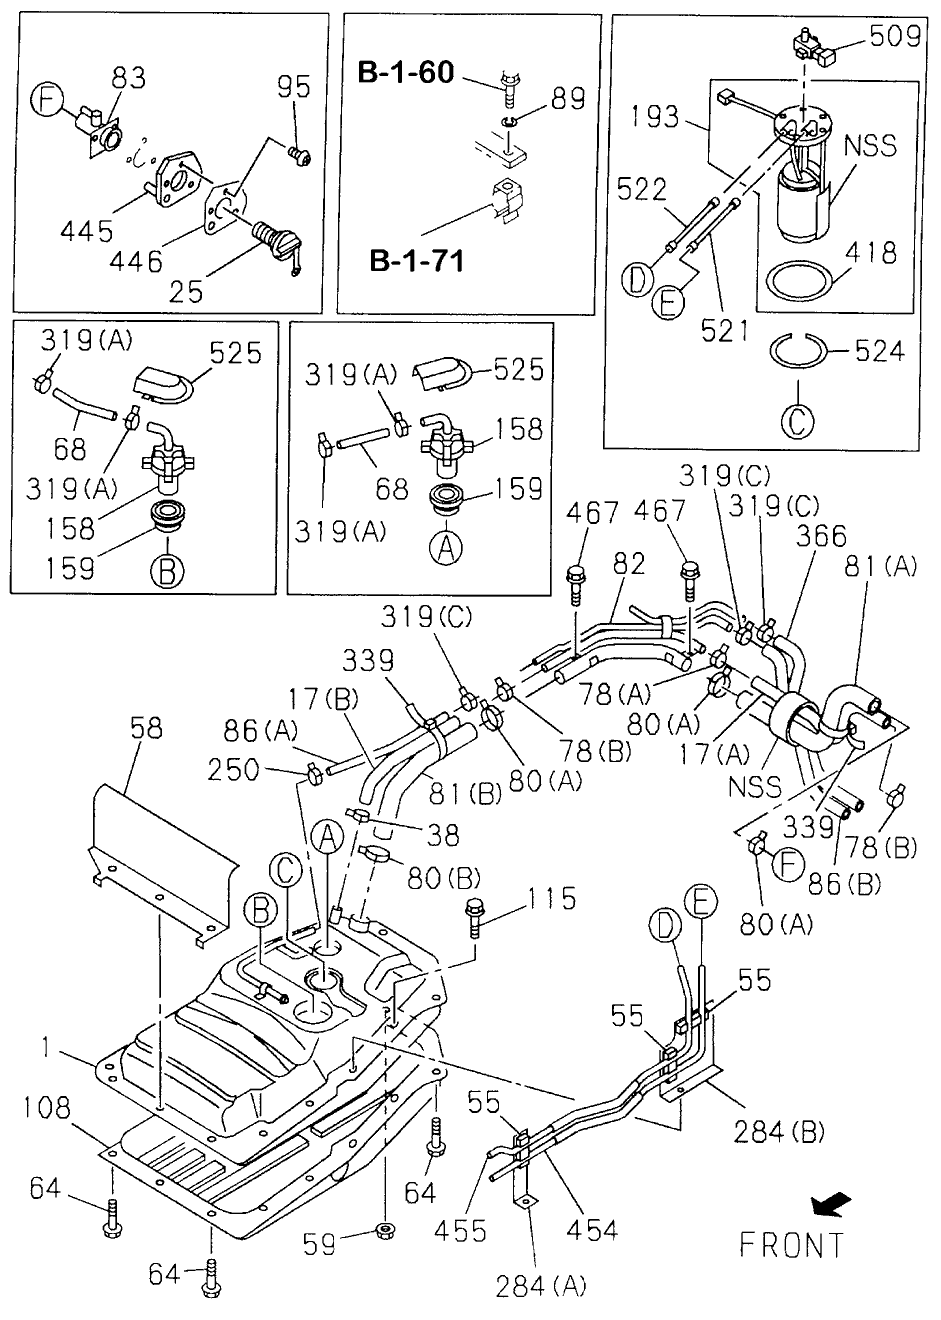 Honda Civic Door Parts Diagram On 2001 Honda Accord Door Lock Diagram